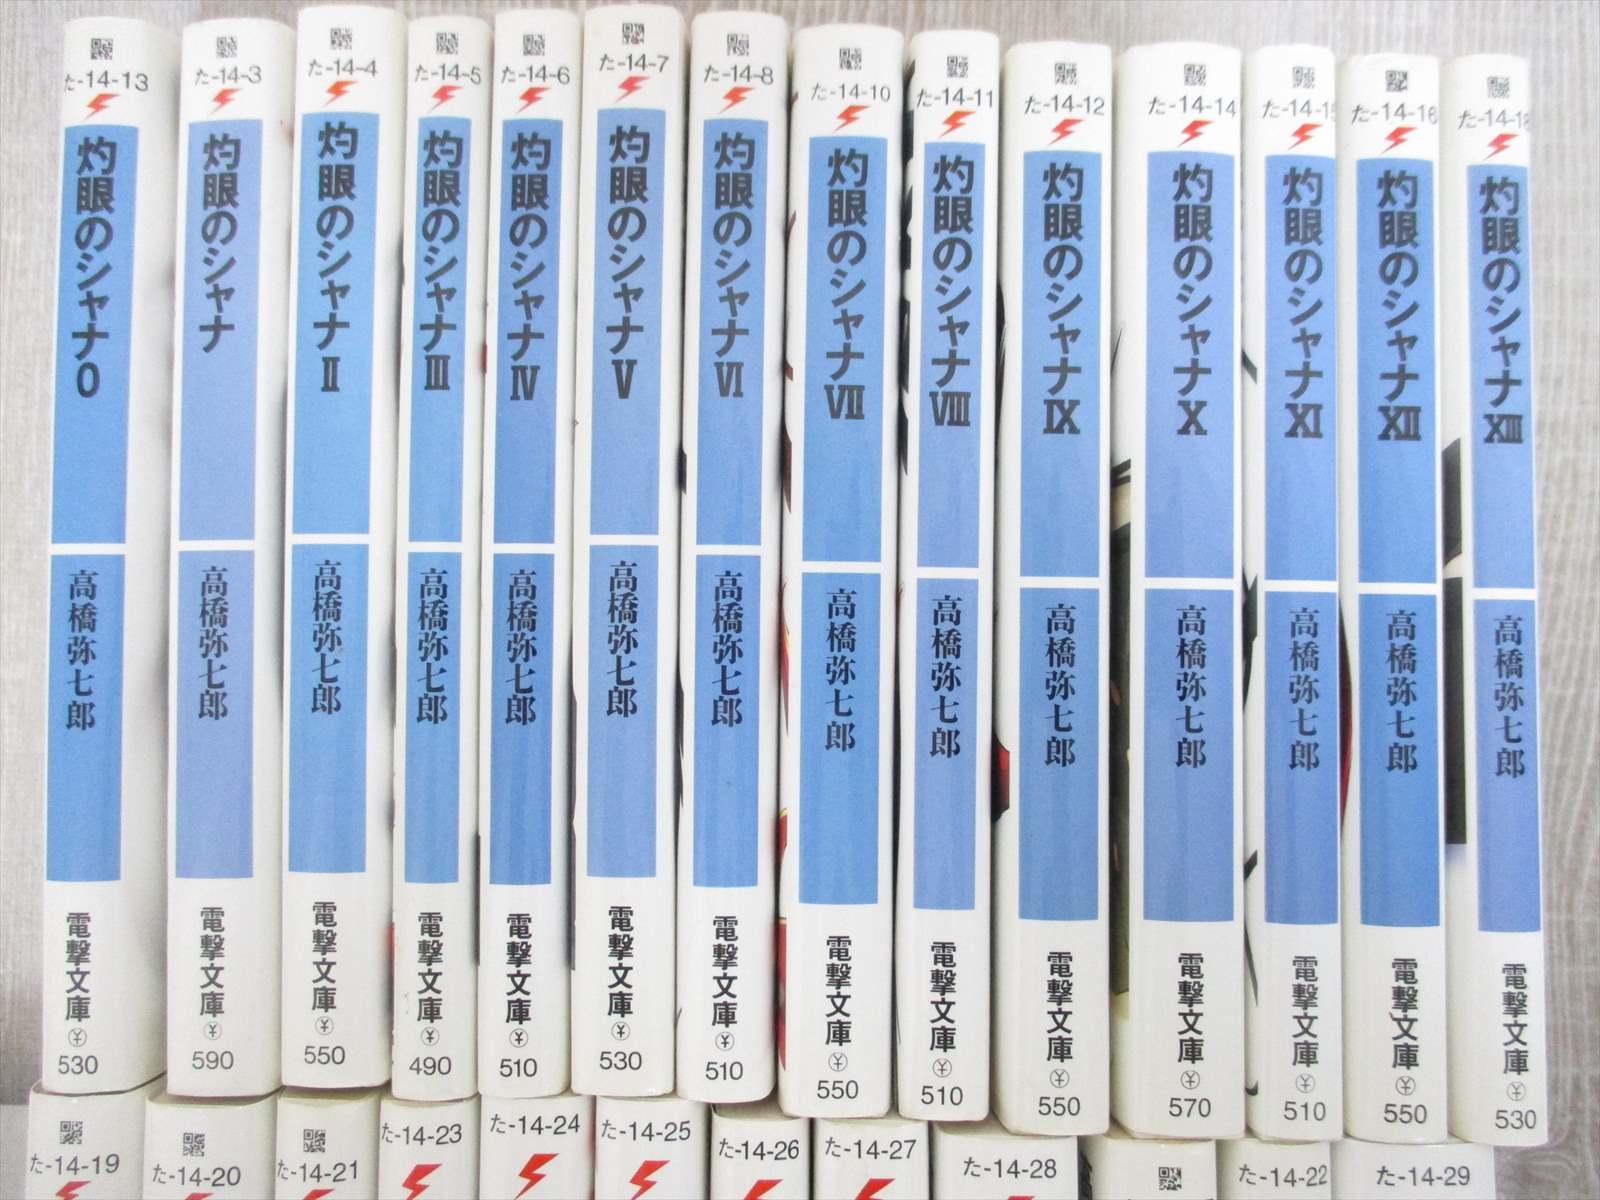 SHAKUGAN NO SHANA Novel Complete Set 0-22+S1 S2 S3 Lot of 26 Novels Book MW*